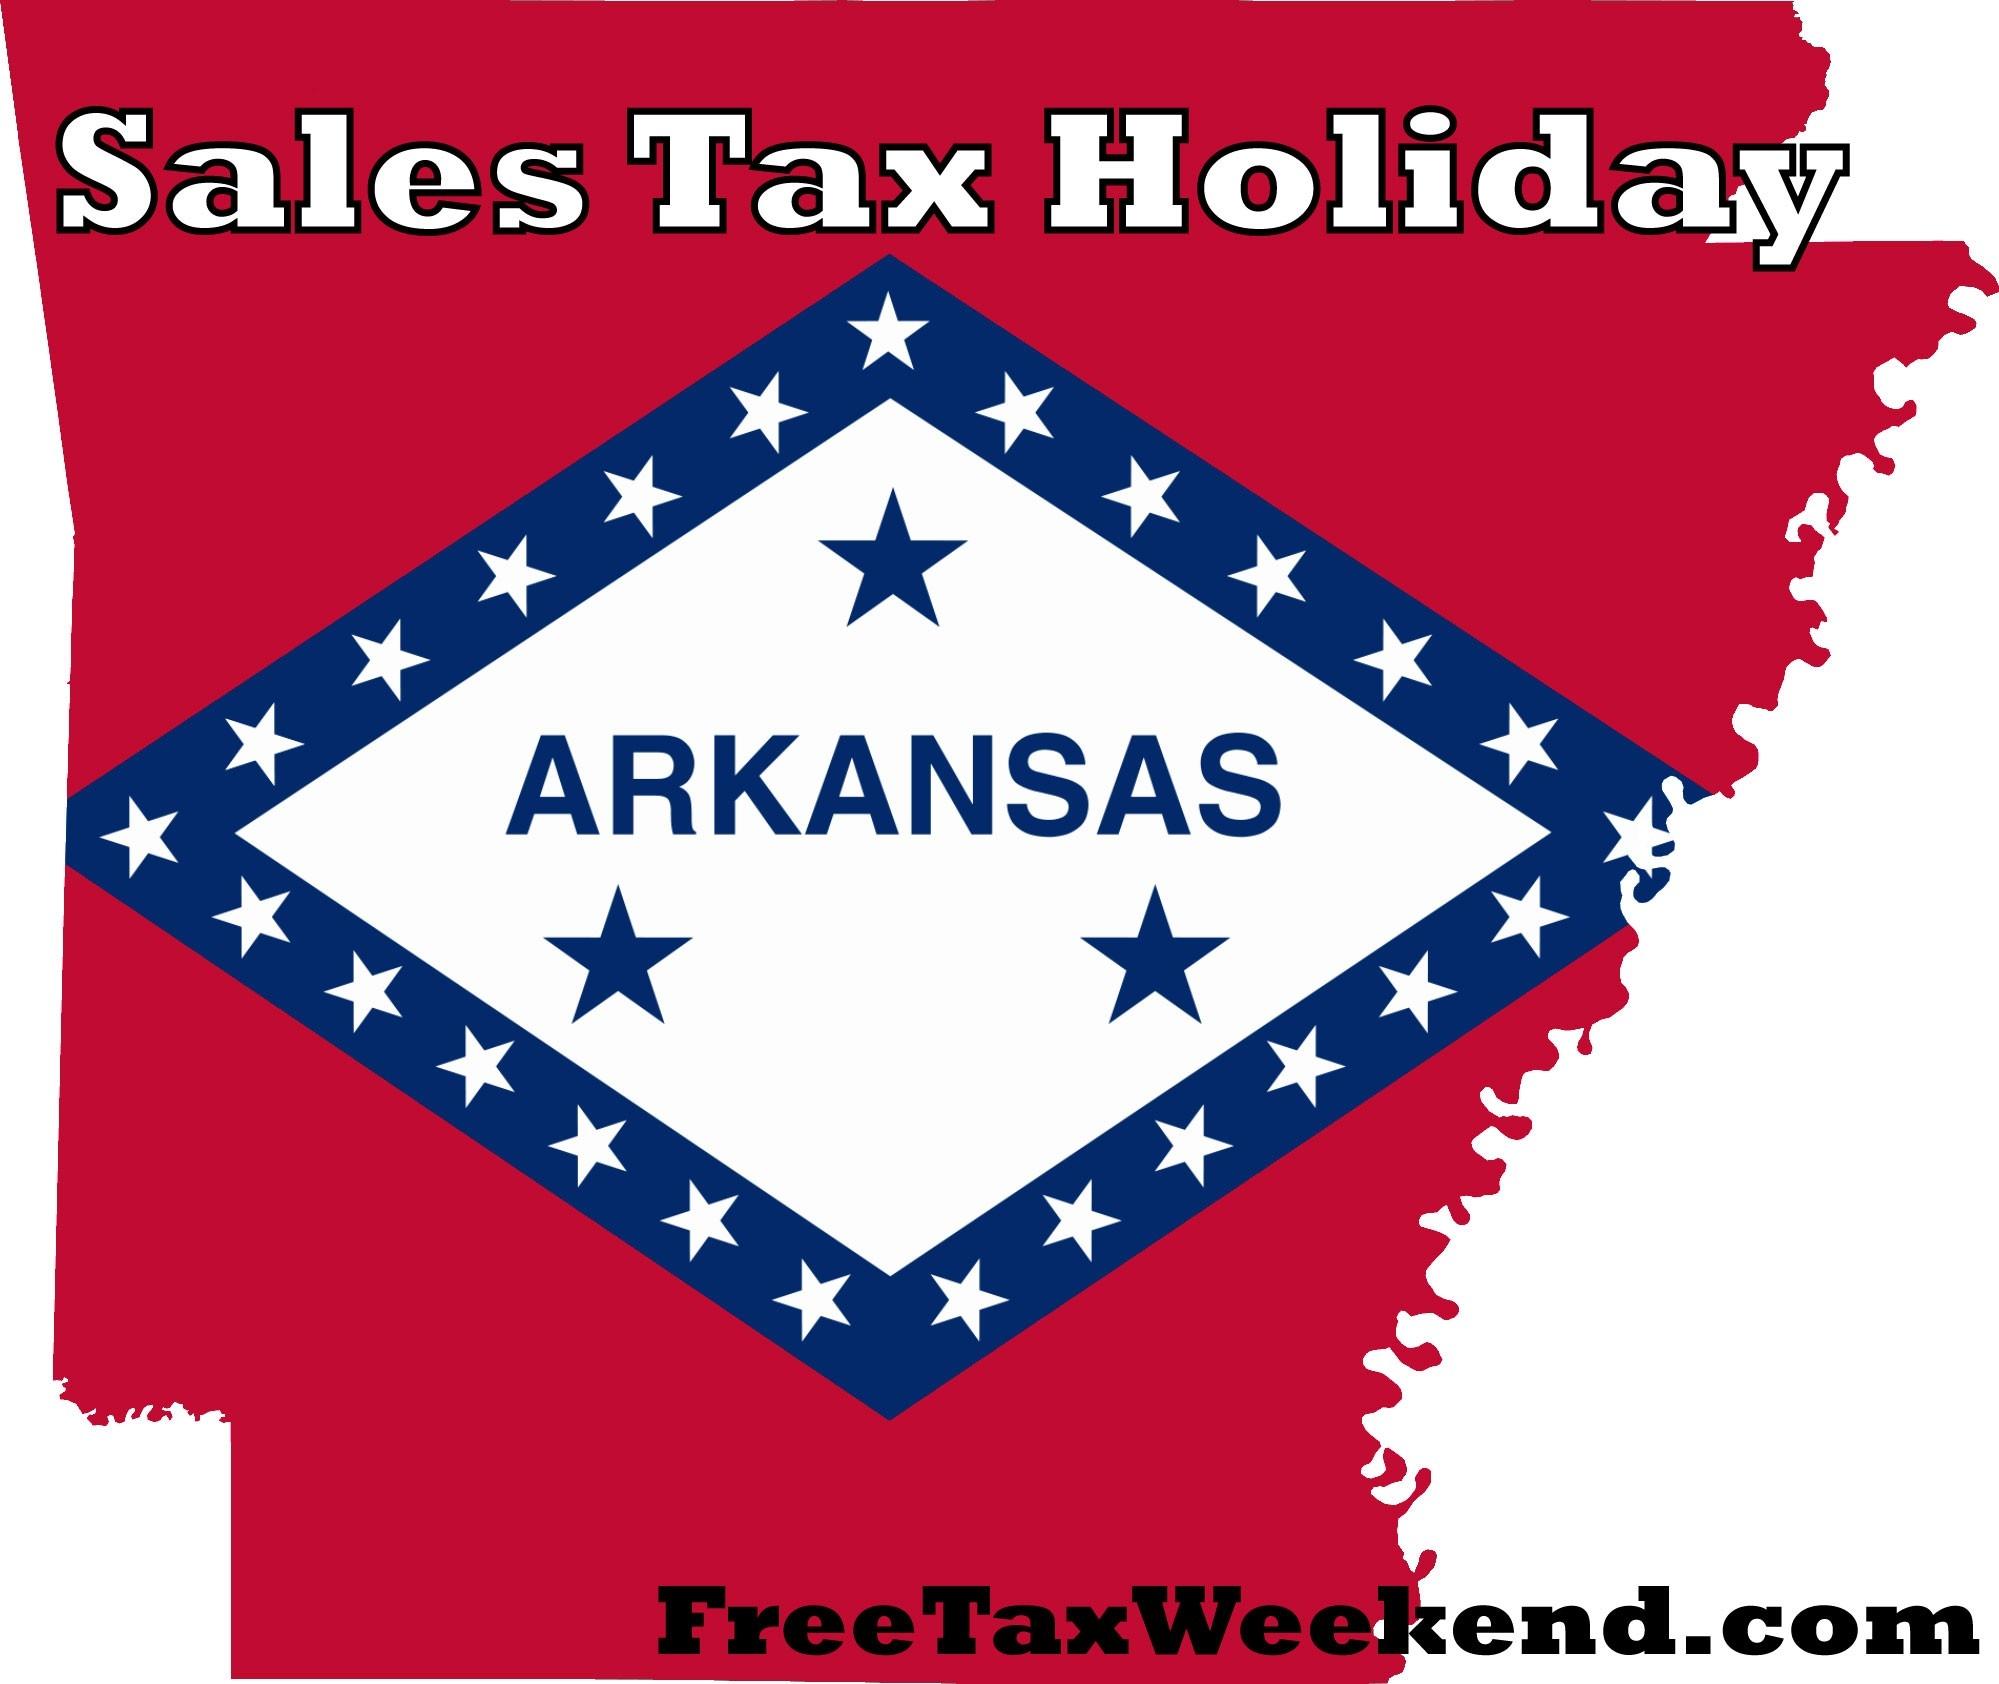 Arkansas Tax Free Weekend 2016 Begins Today! Iowa And  Next Tax Free Weekend In Louisiana